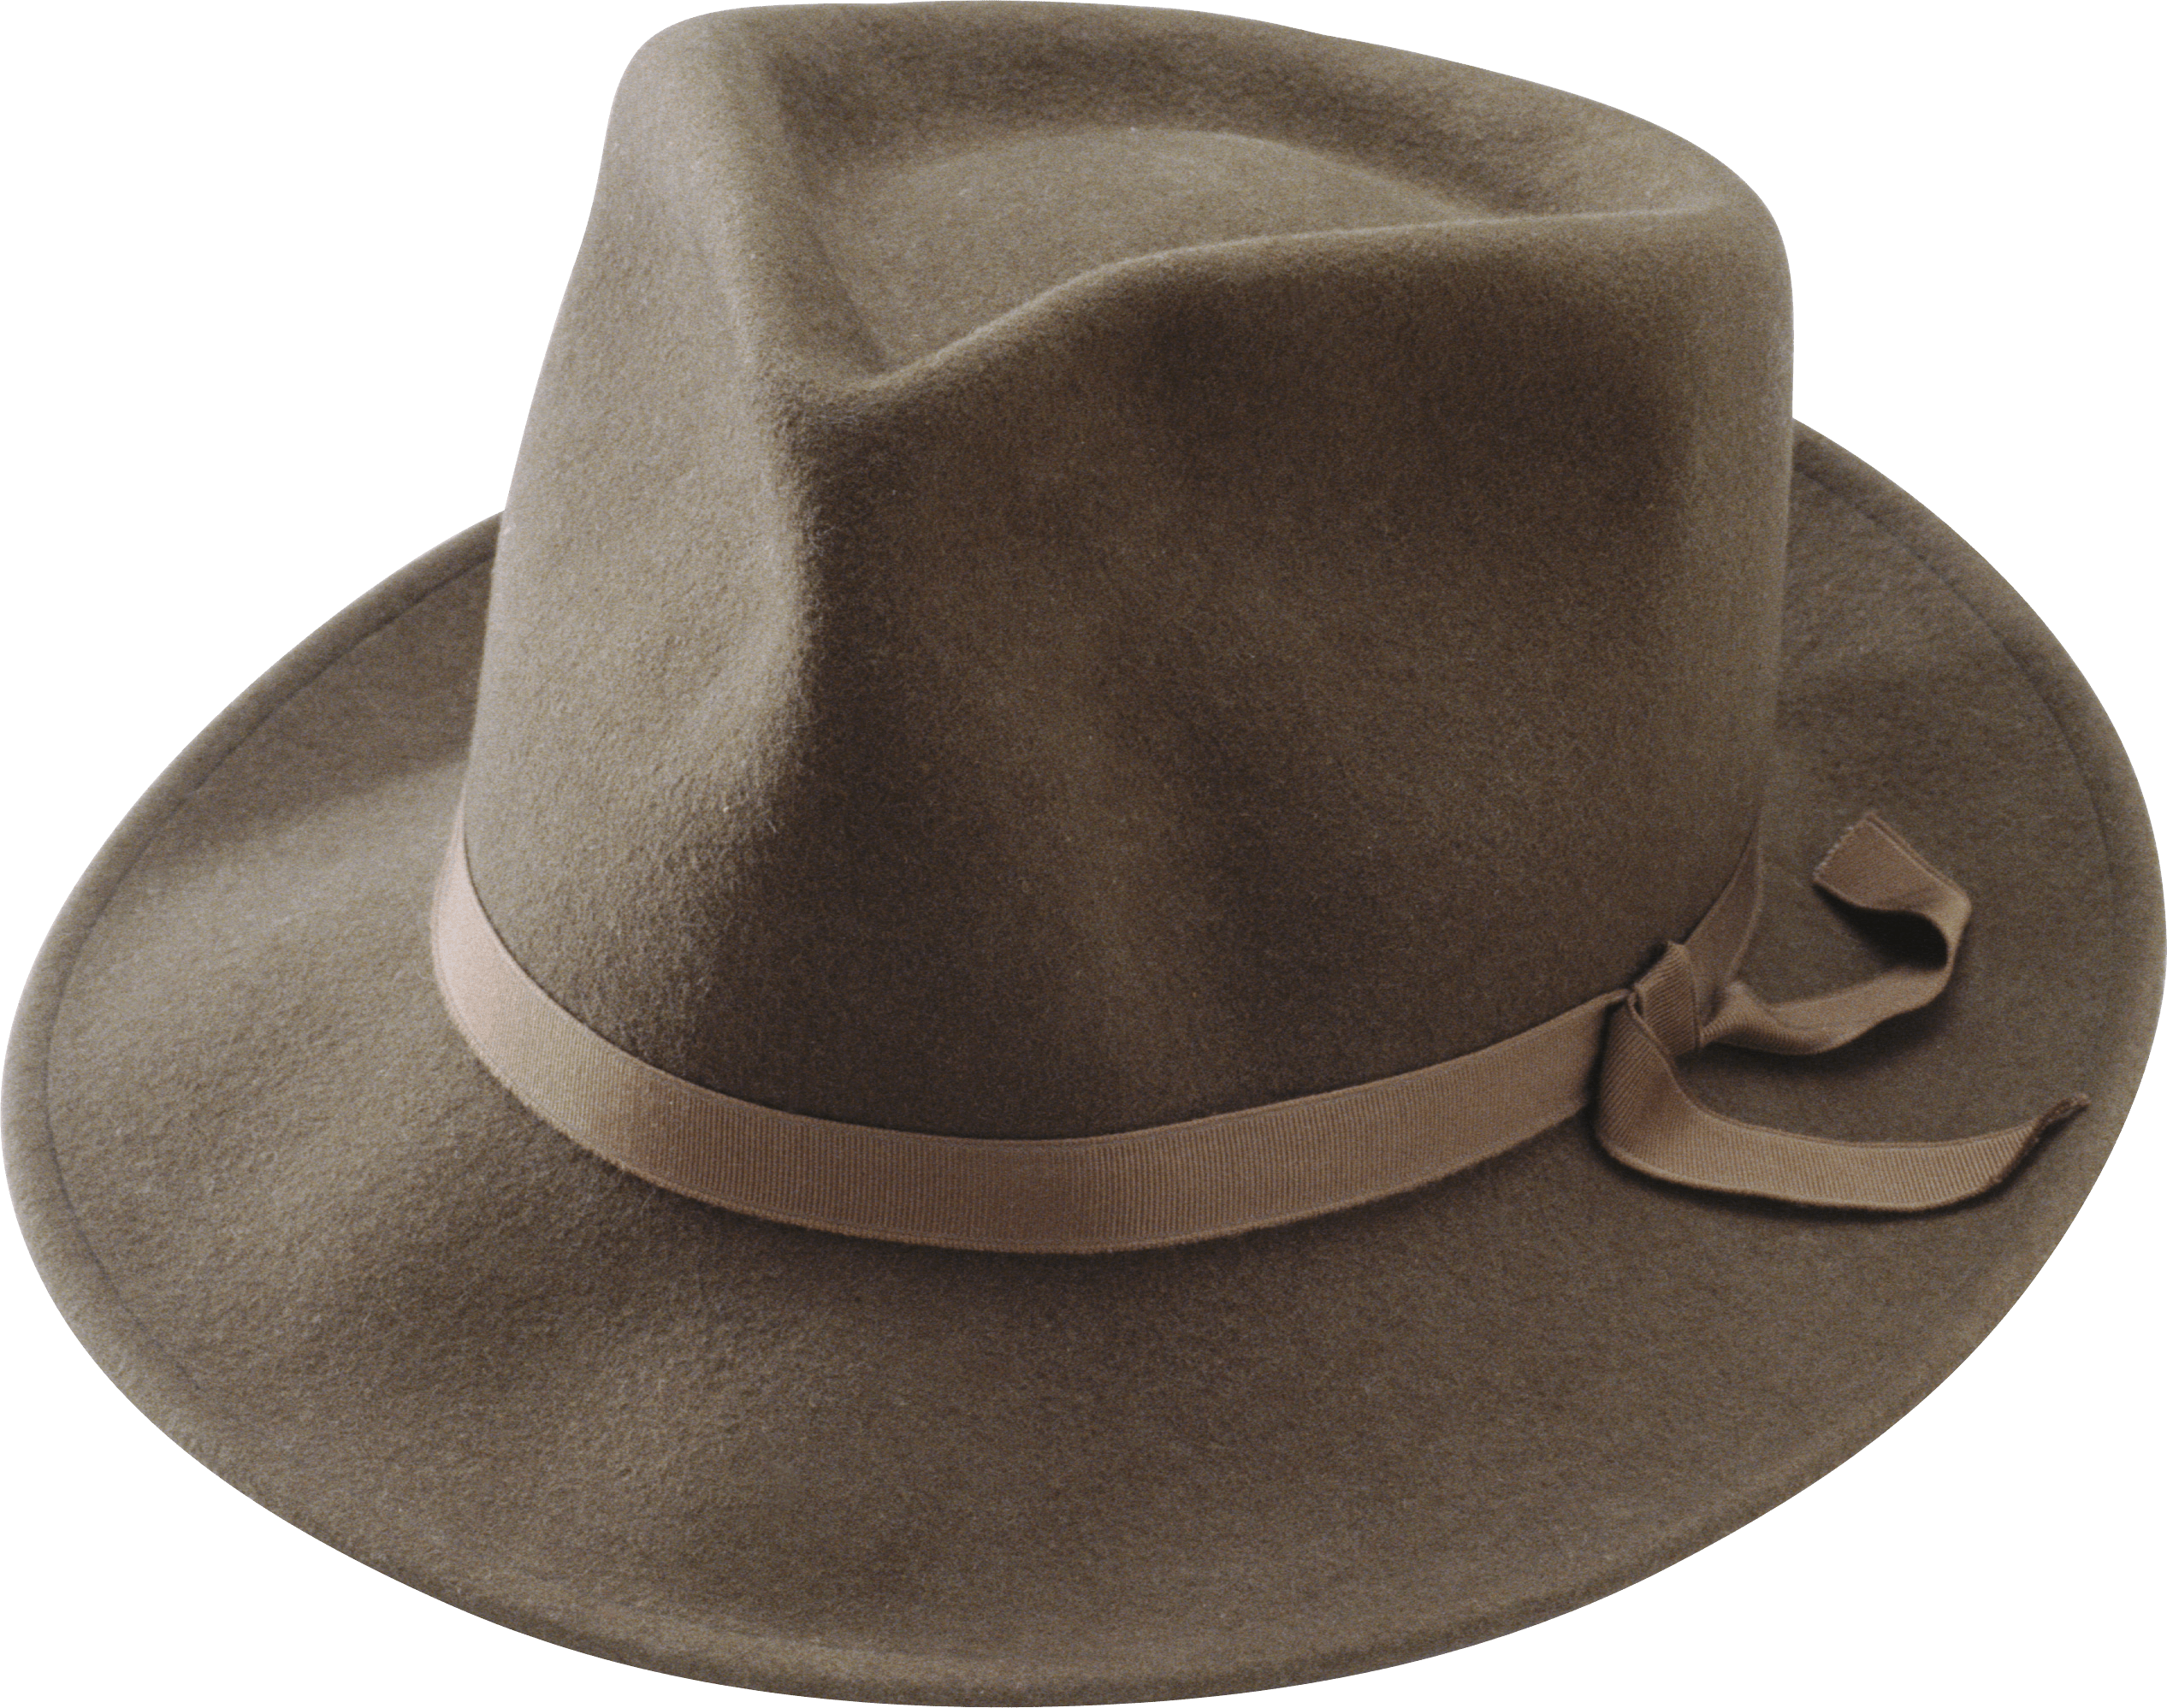 534b644f35b53 Lady Hat transparent PNG - StickPNG